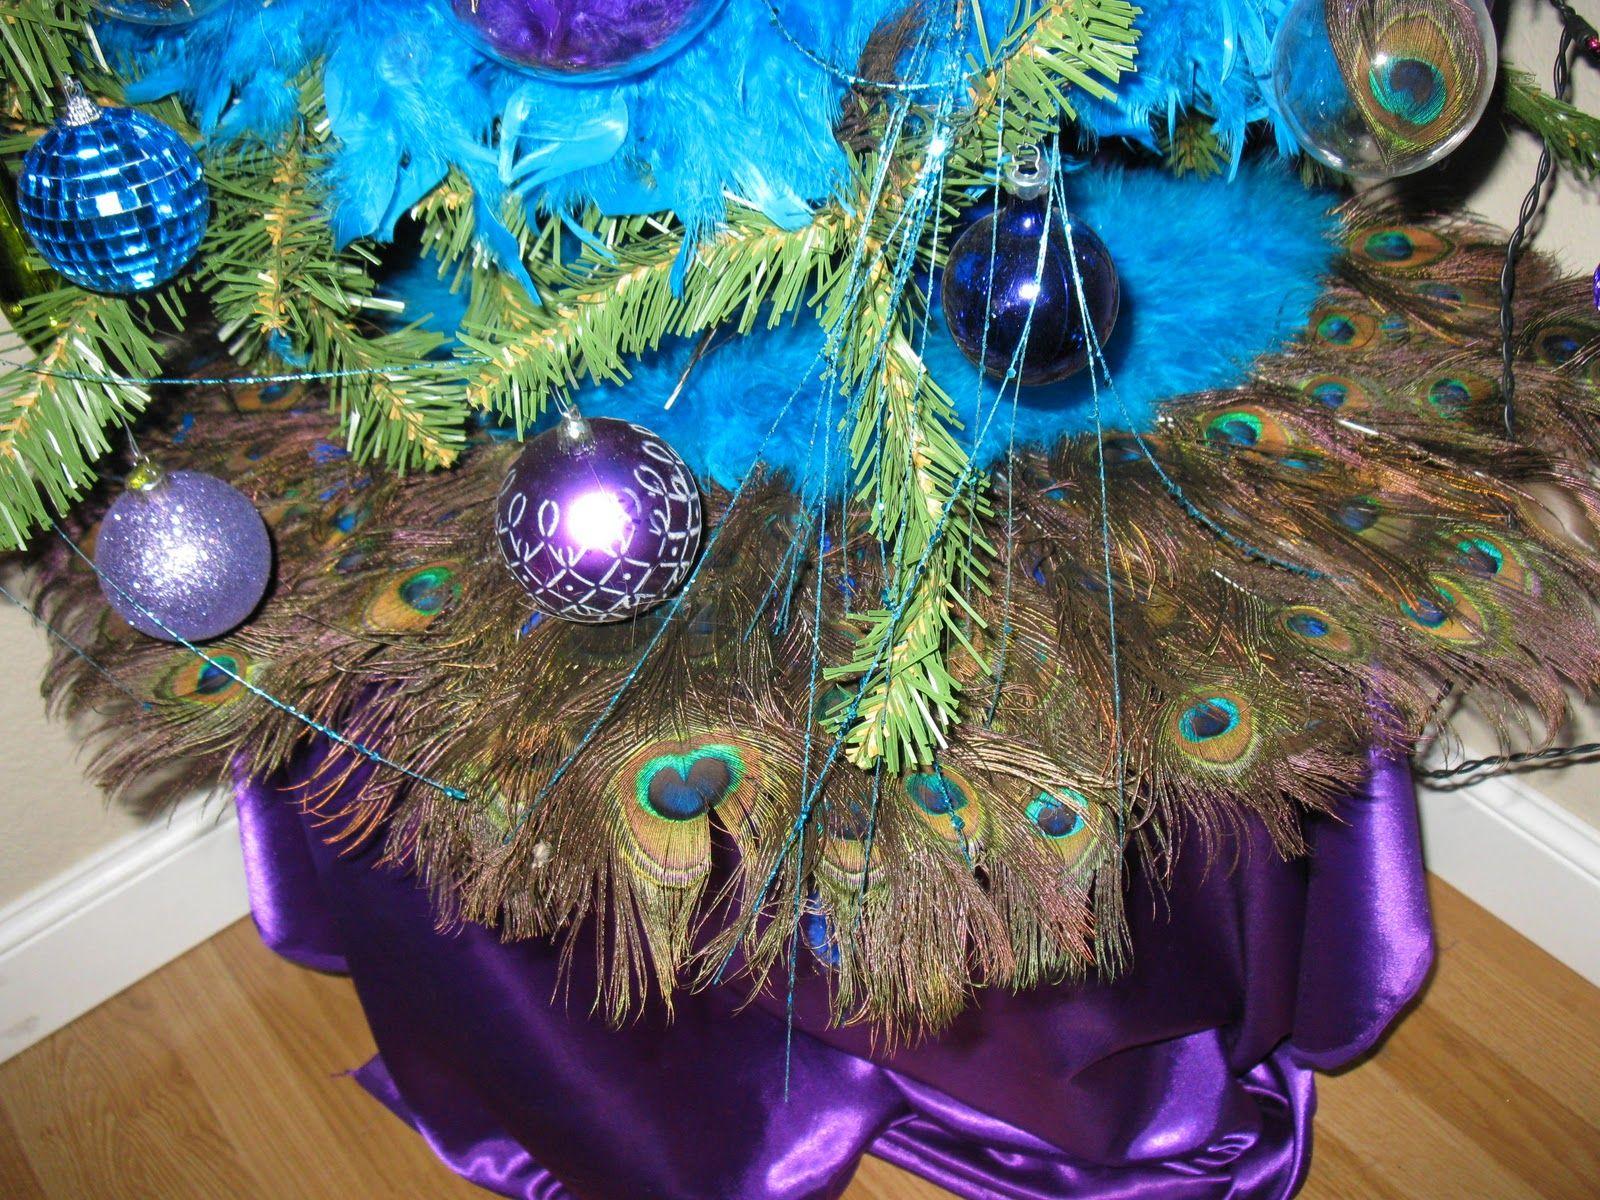 peacock christmas tree skirt im so making this for my tree next year - Peacock Christmas Tree Skirt